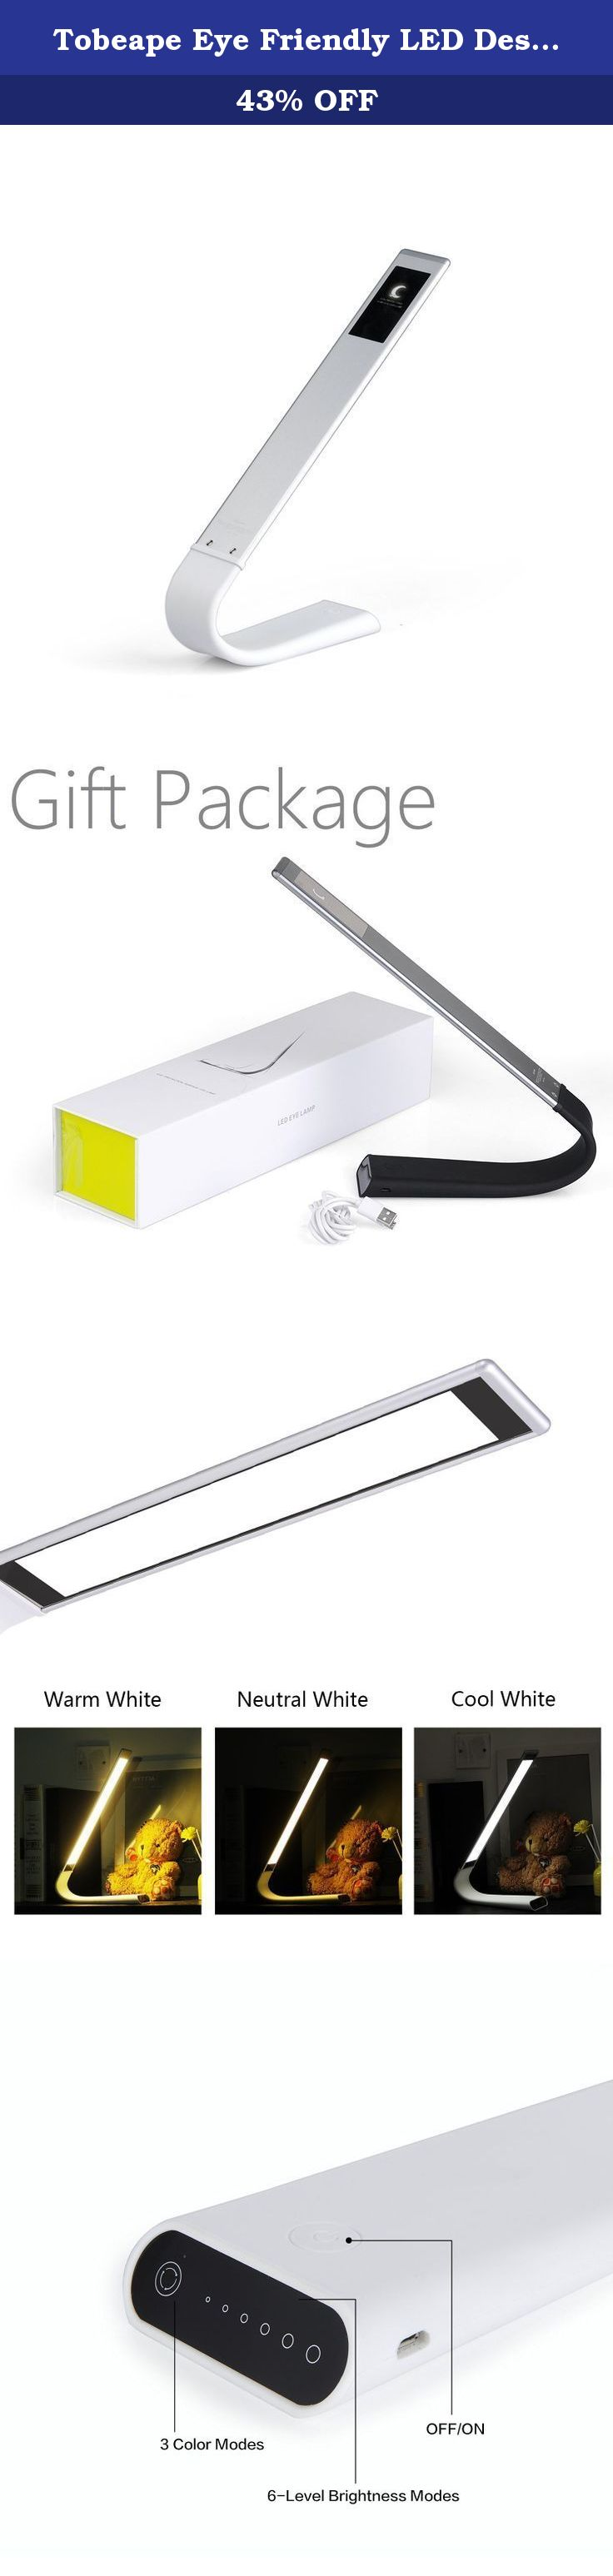 tobeape eye friendly led desk lamp cordless touch sensitive